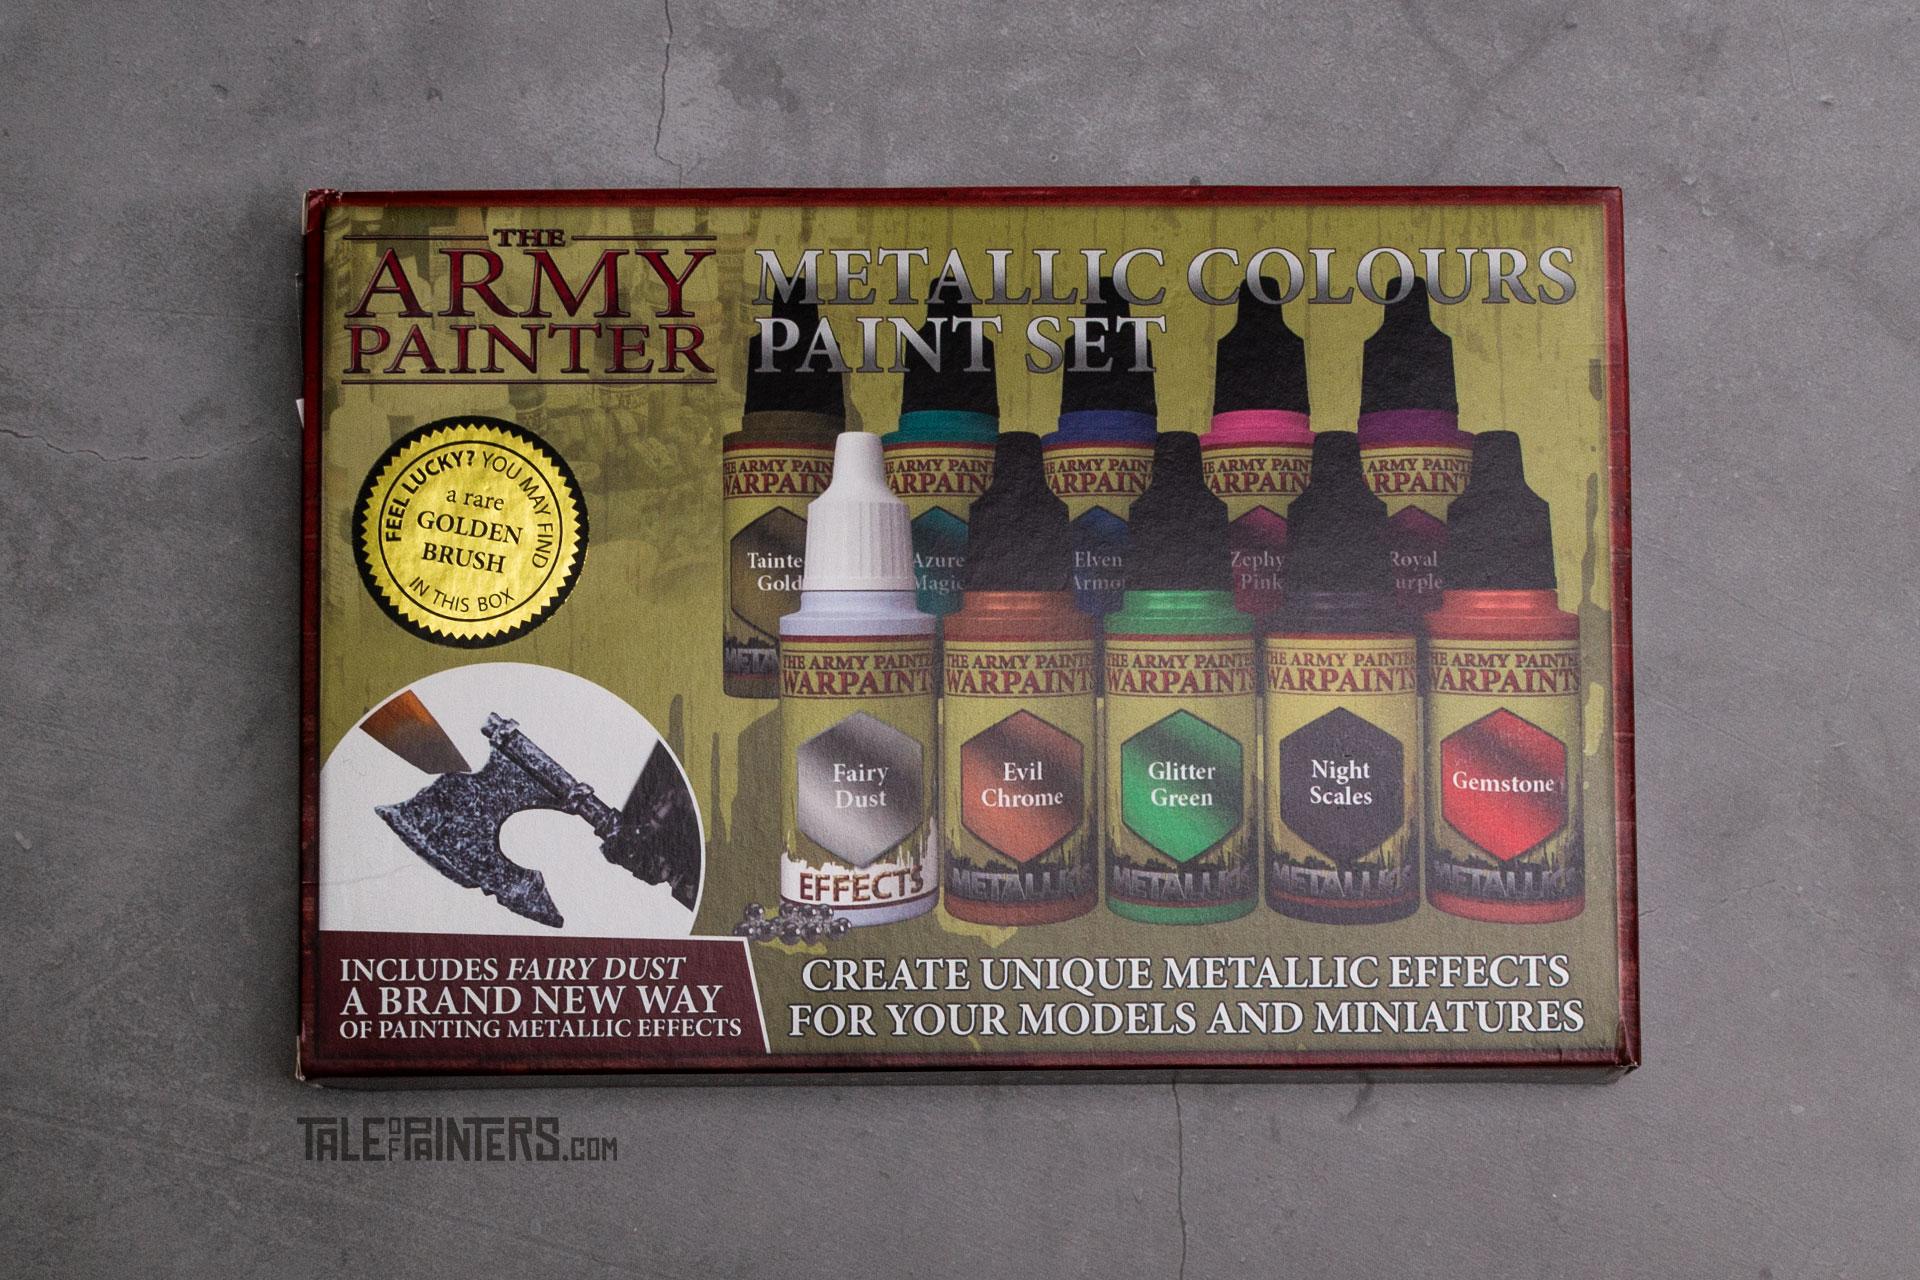 The boxof The Army Painter's Metallic Colours Warpaints set